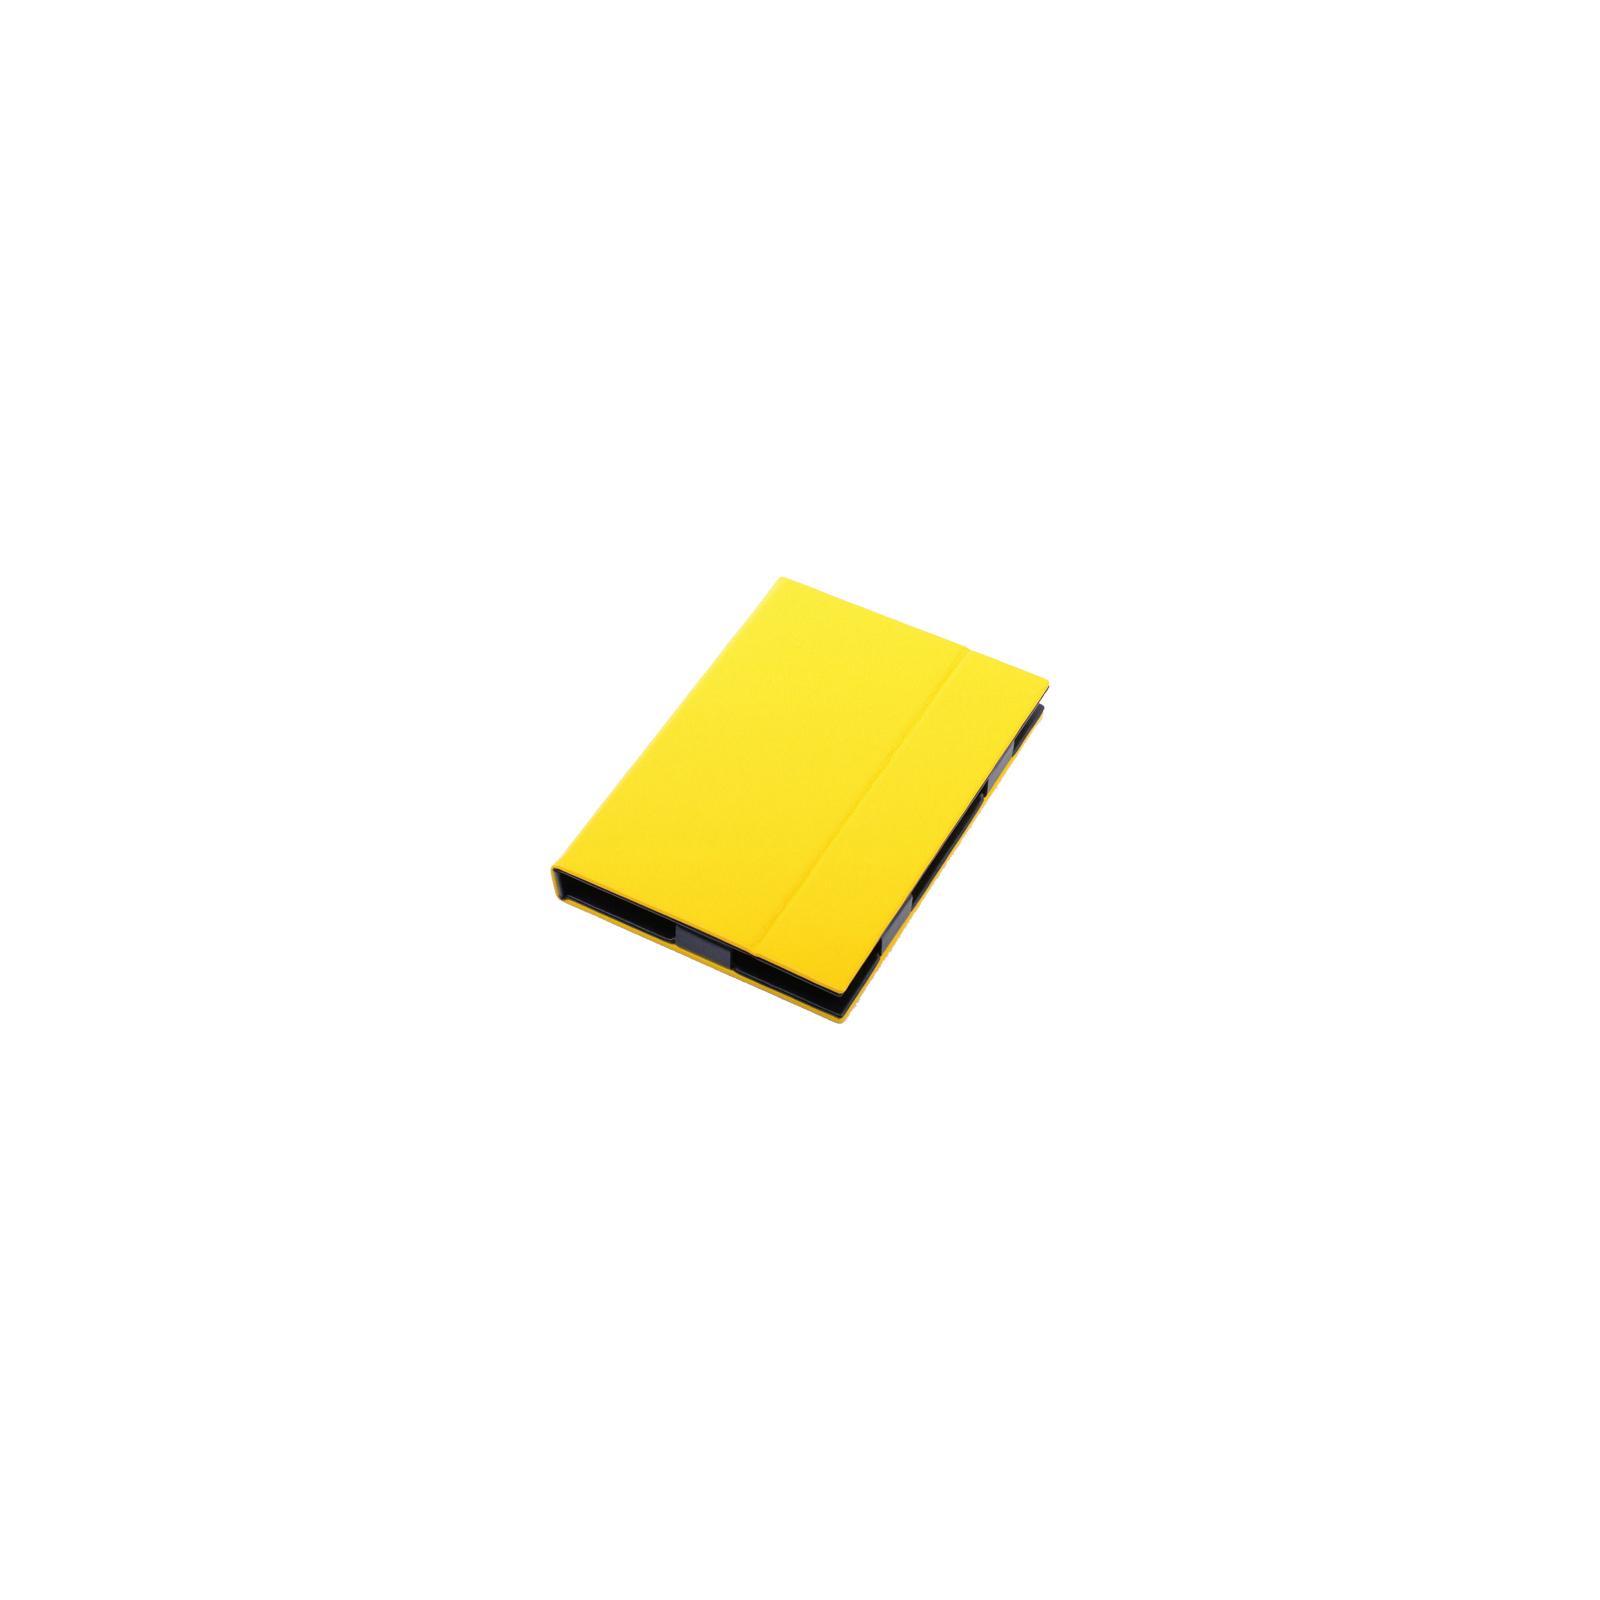 Чехол для планшета Vento 10.1 Desire Bright -yellow